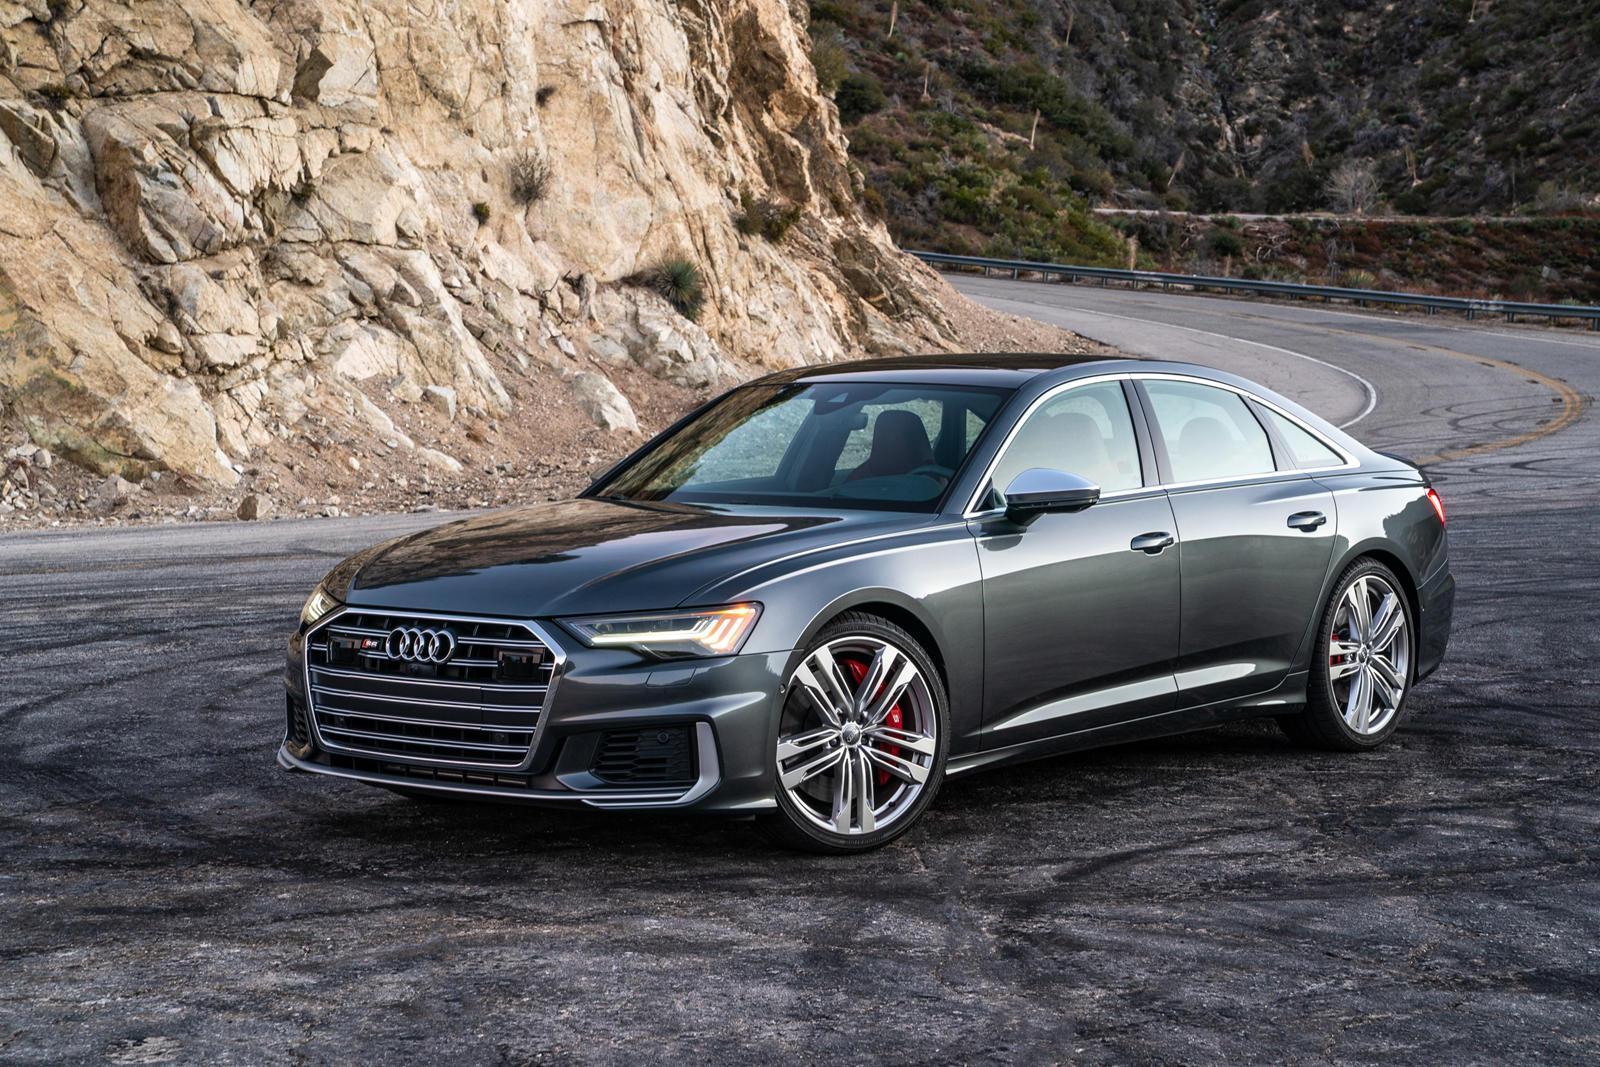 5 Audi S5: Review, Trims, Specs, Price, New Interior Features